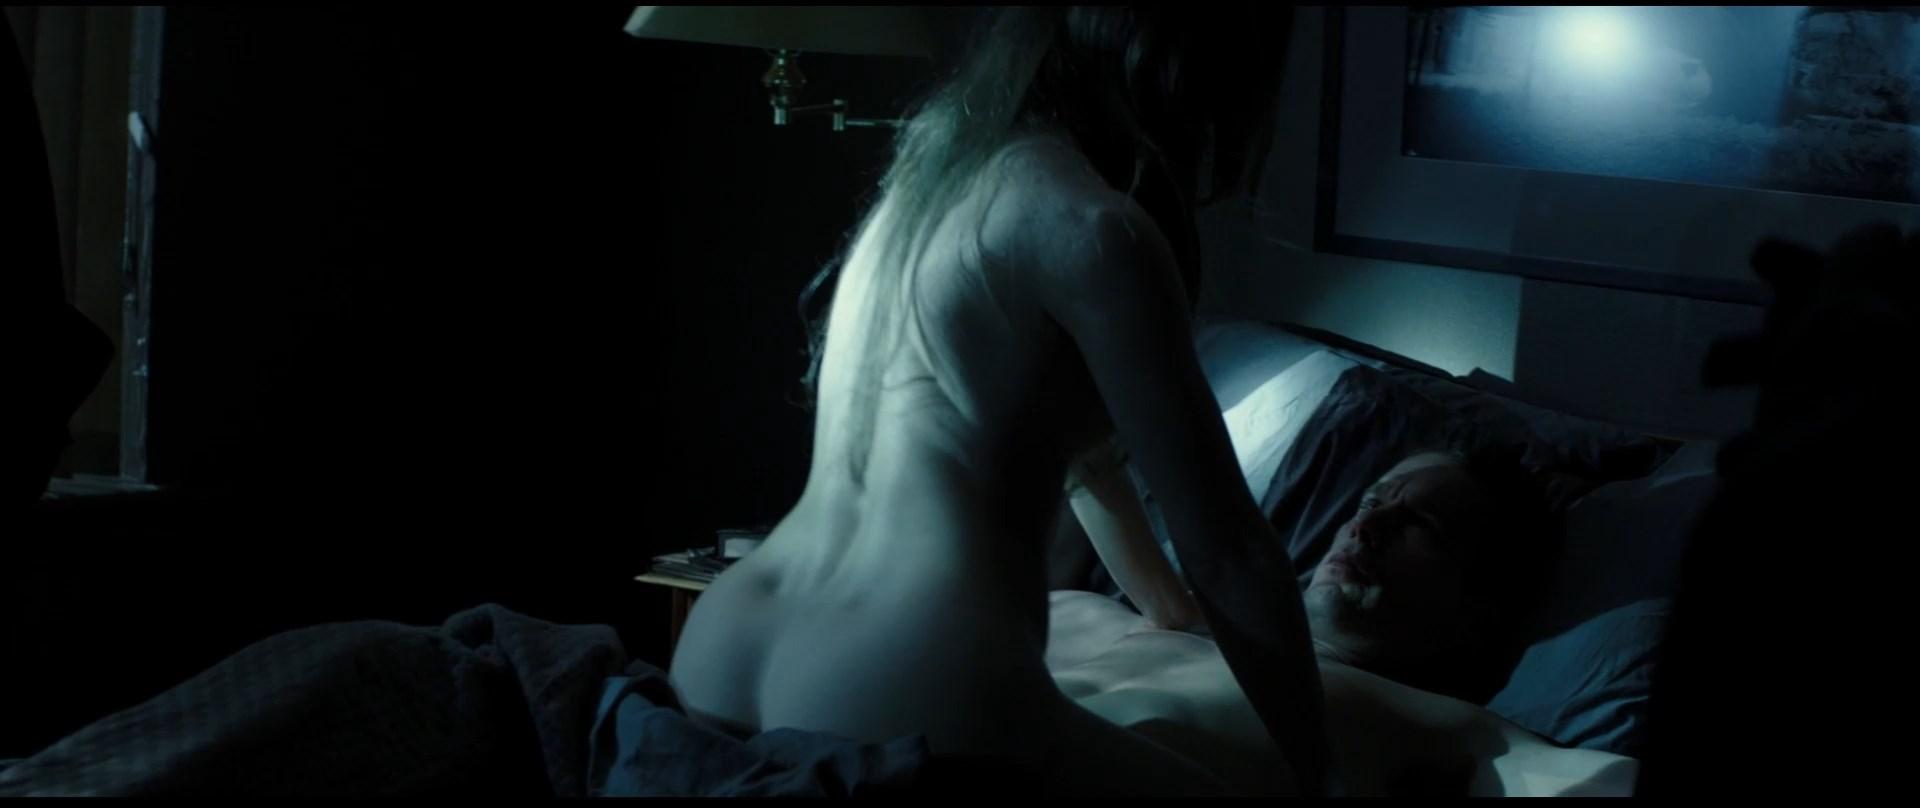 Emma-Watson-Nude-2